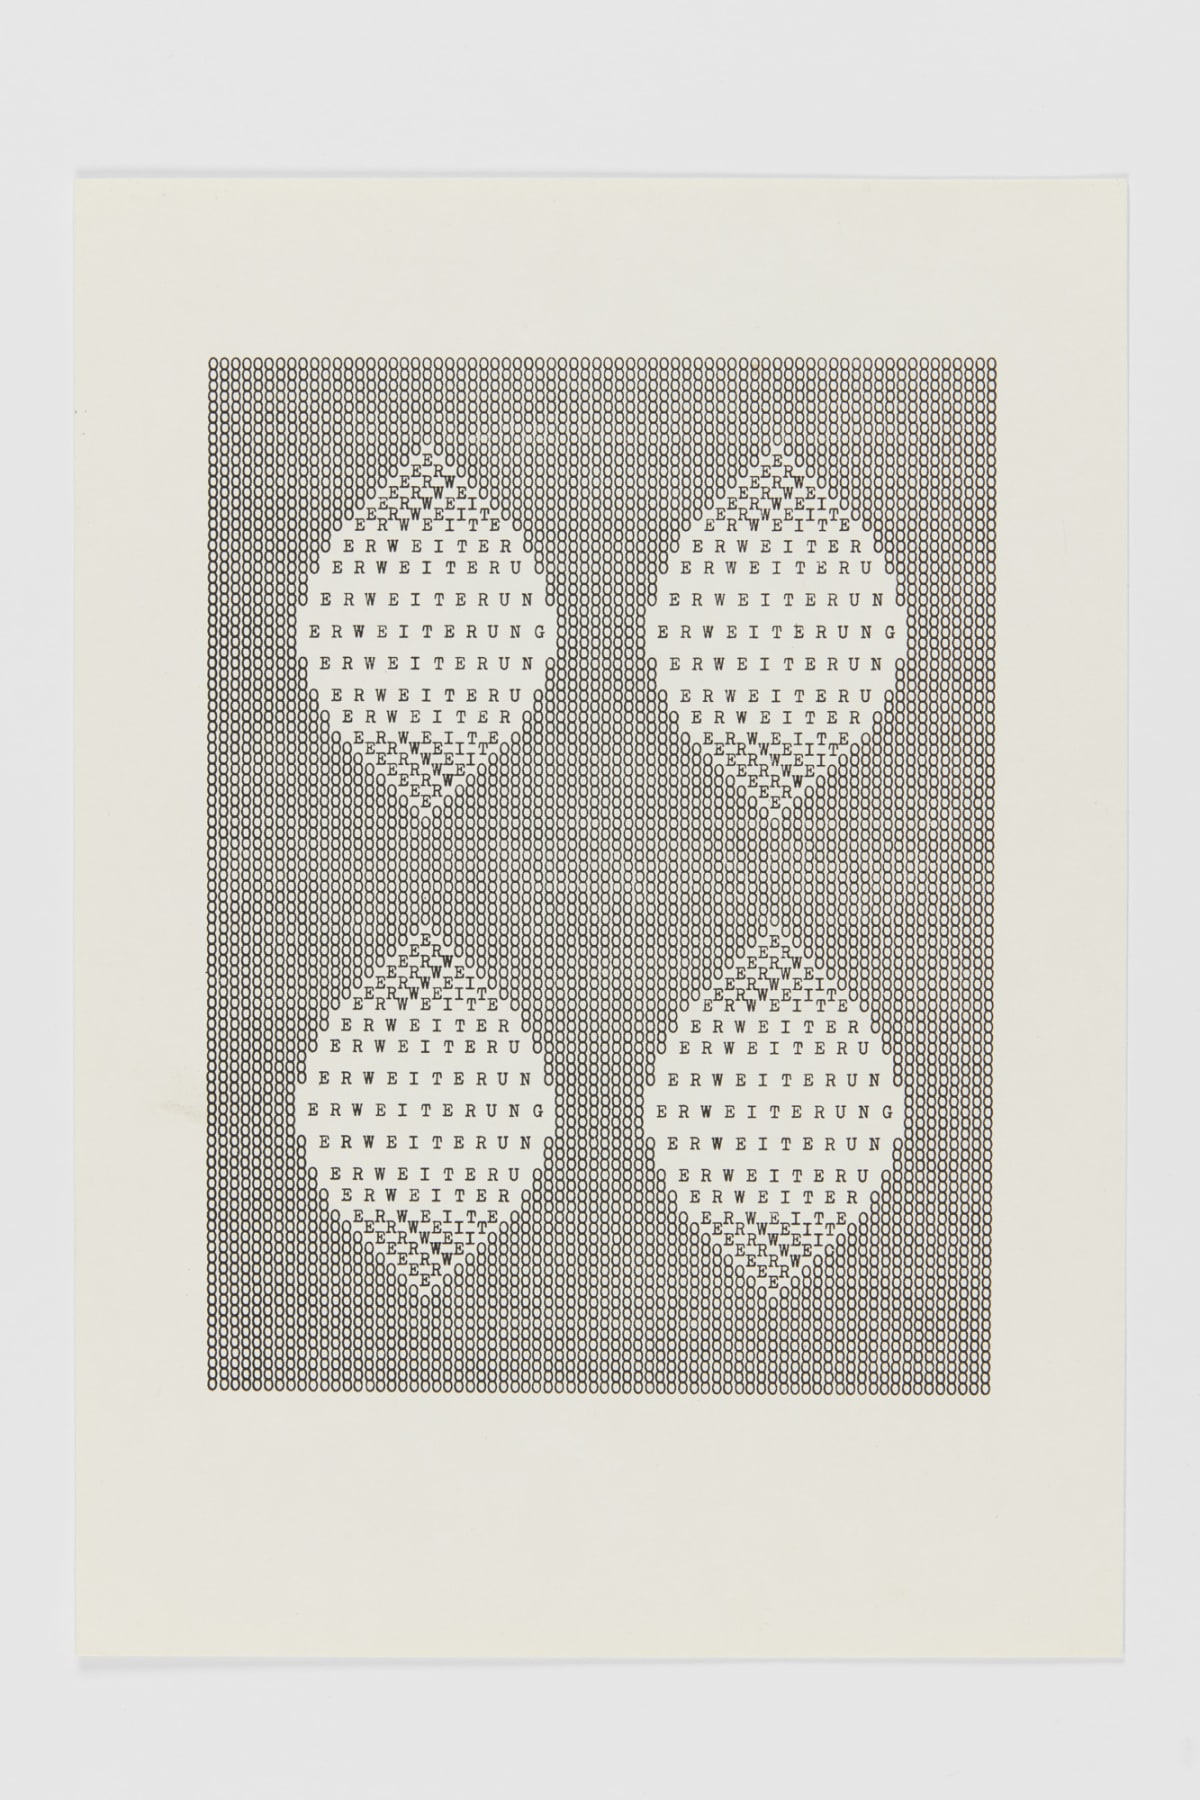 Ruth WOLF-REHFELDT Erweiterung, c.1980 print (zinc lithograph) 29.9 x 21.1 cm